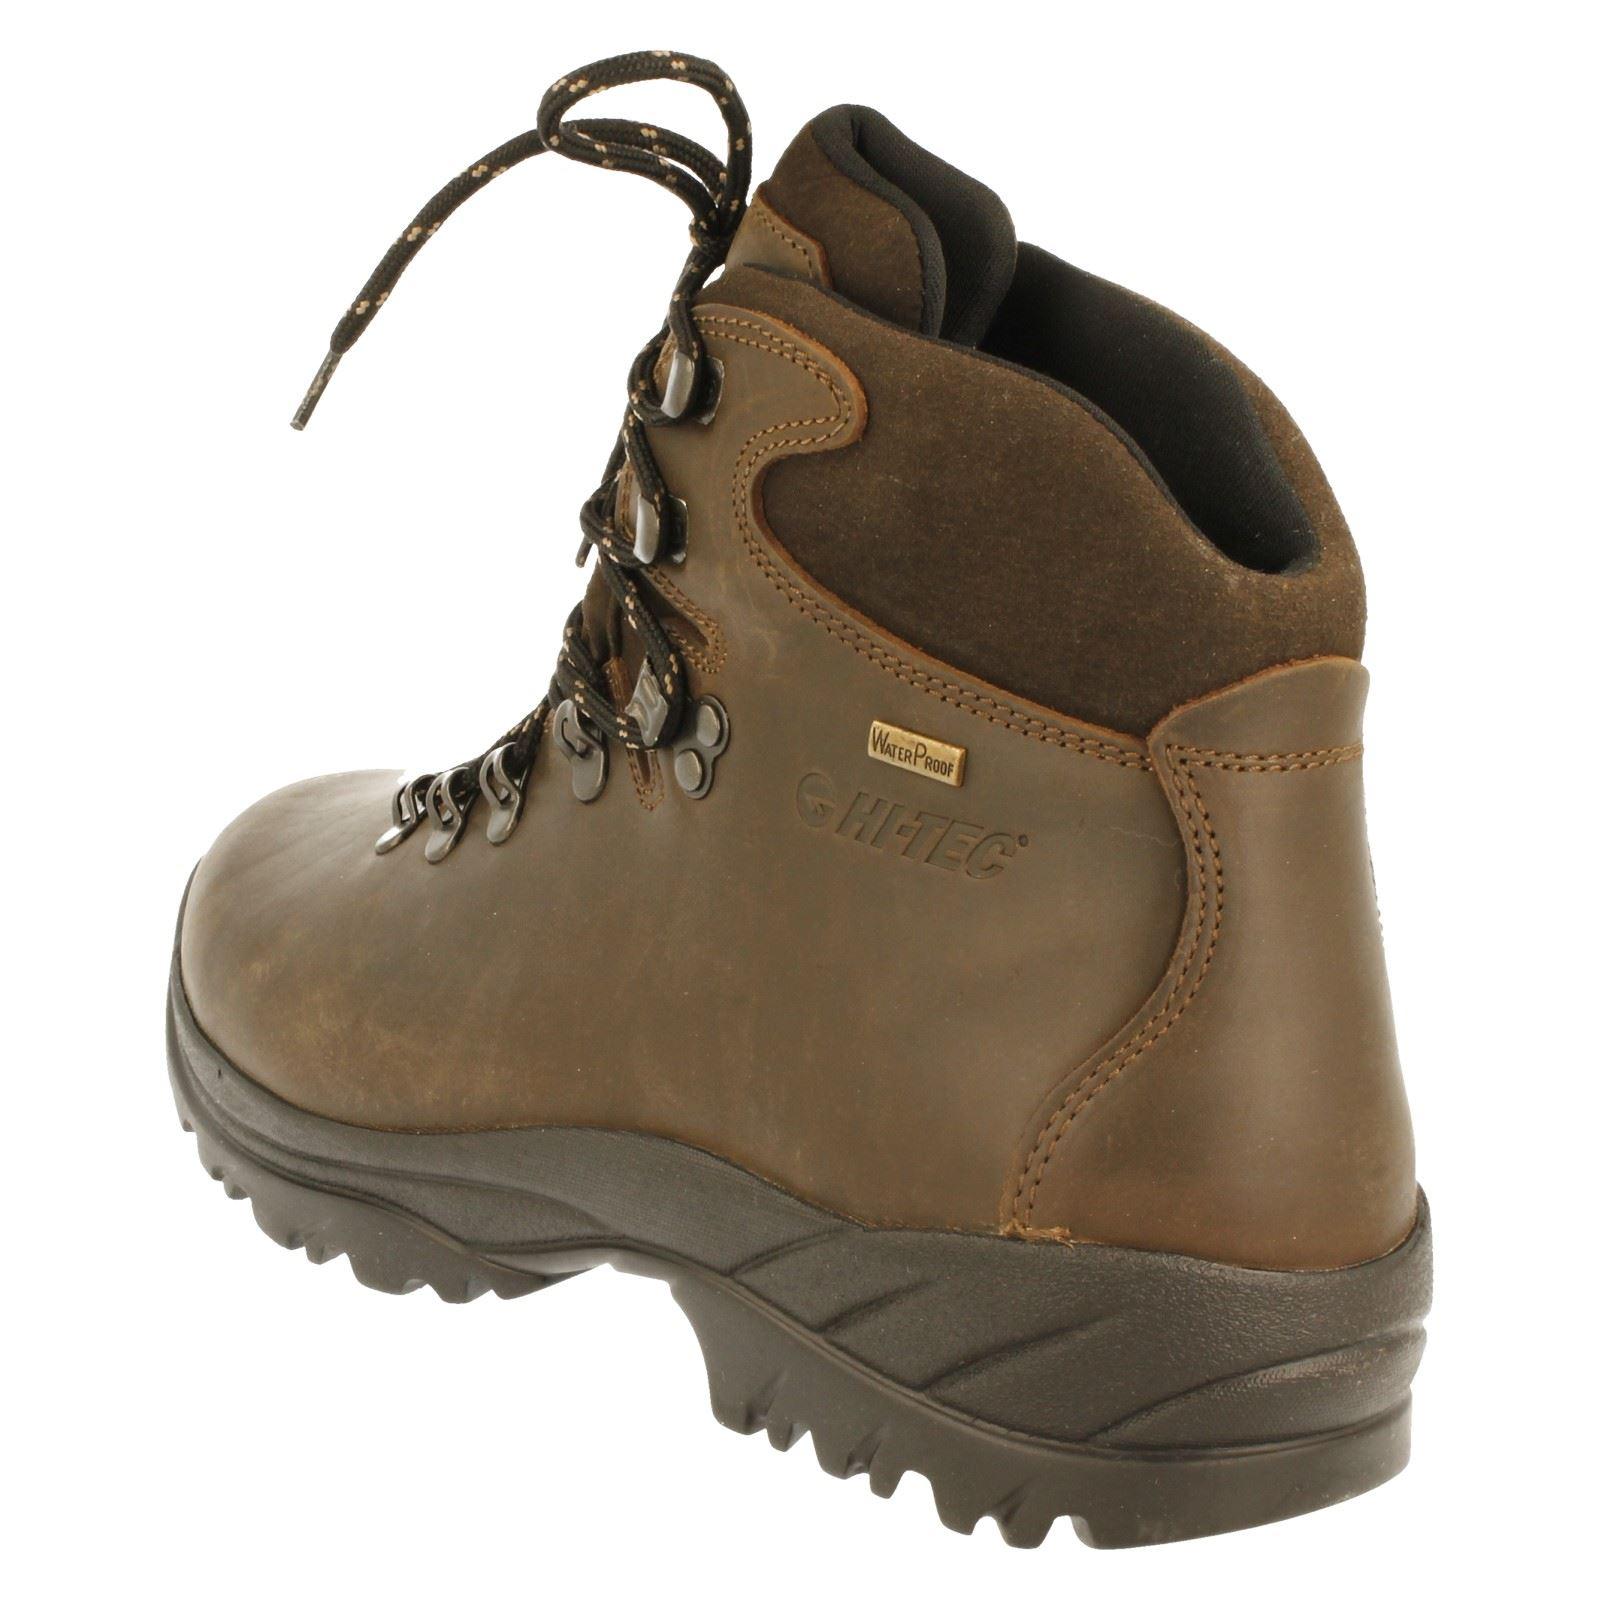 Uomo Hi-Tec Ravine Waterprrof Walking Boots Ravine Hi-Tec -W eadd5d